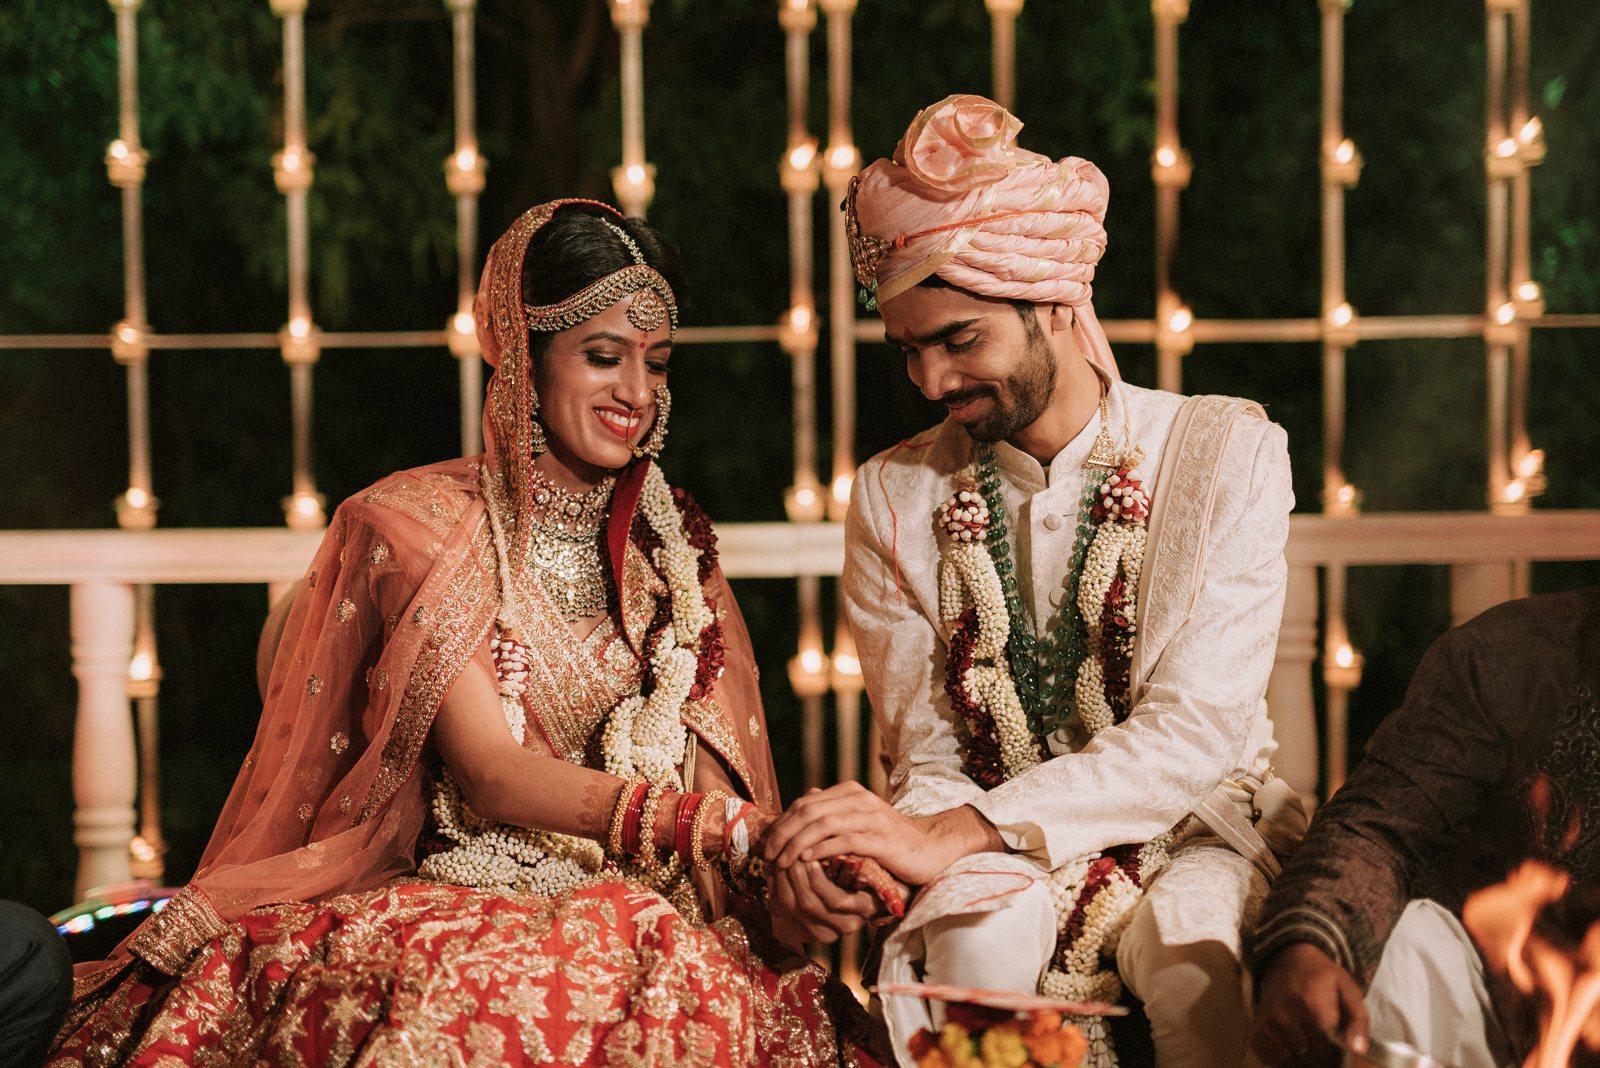 wedding in india - destination wedding photographer-275.jpg